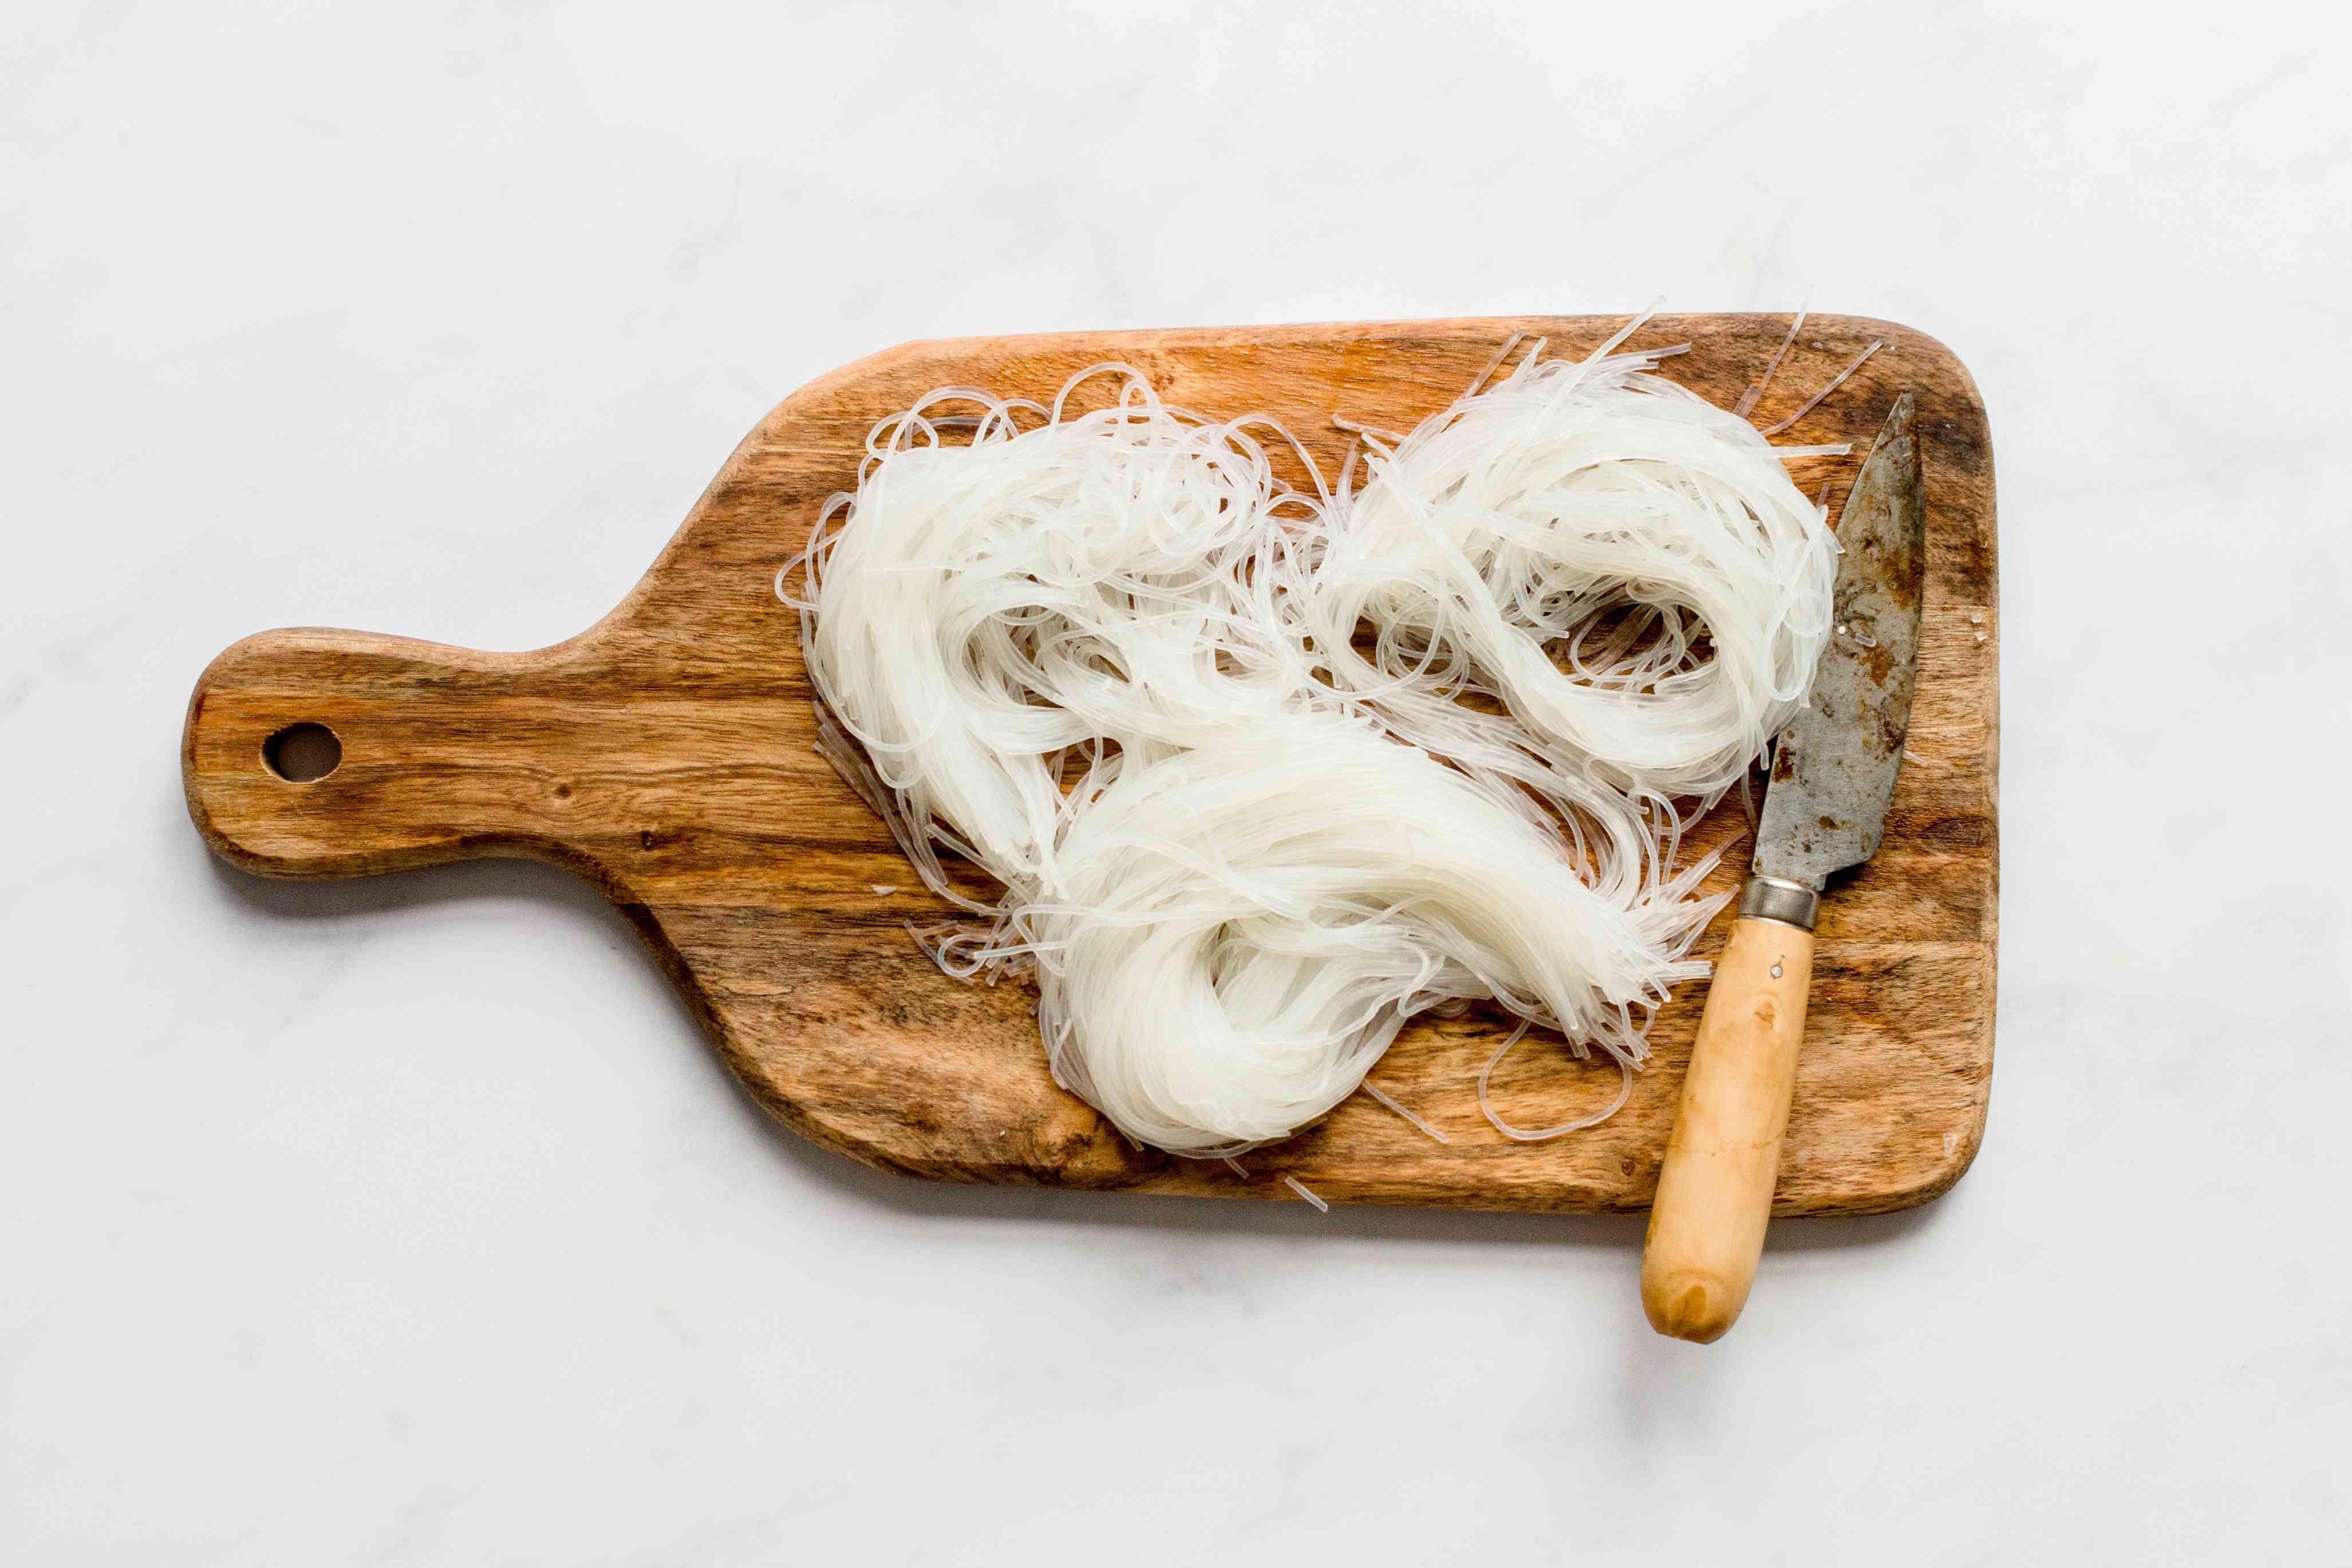 rice noodles cut into three pieces